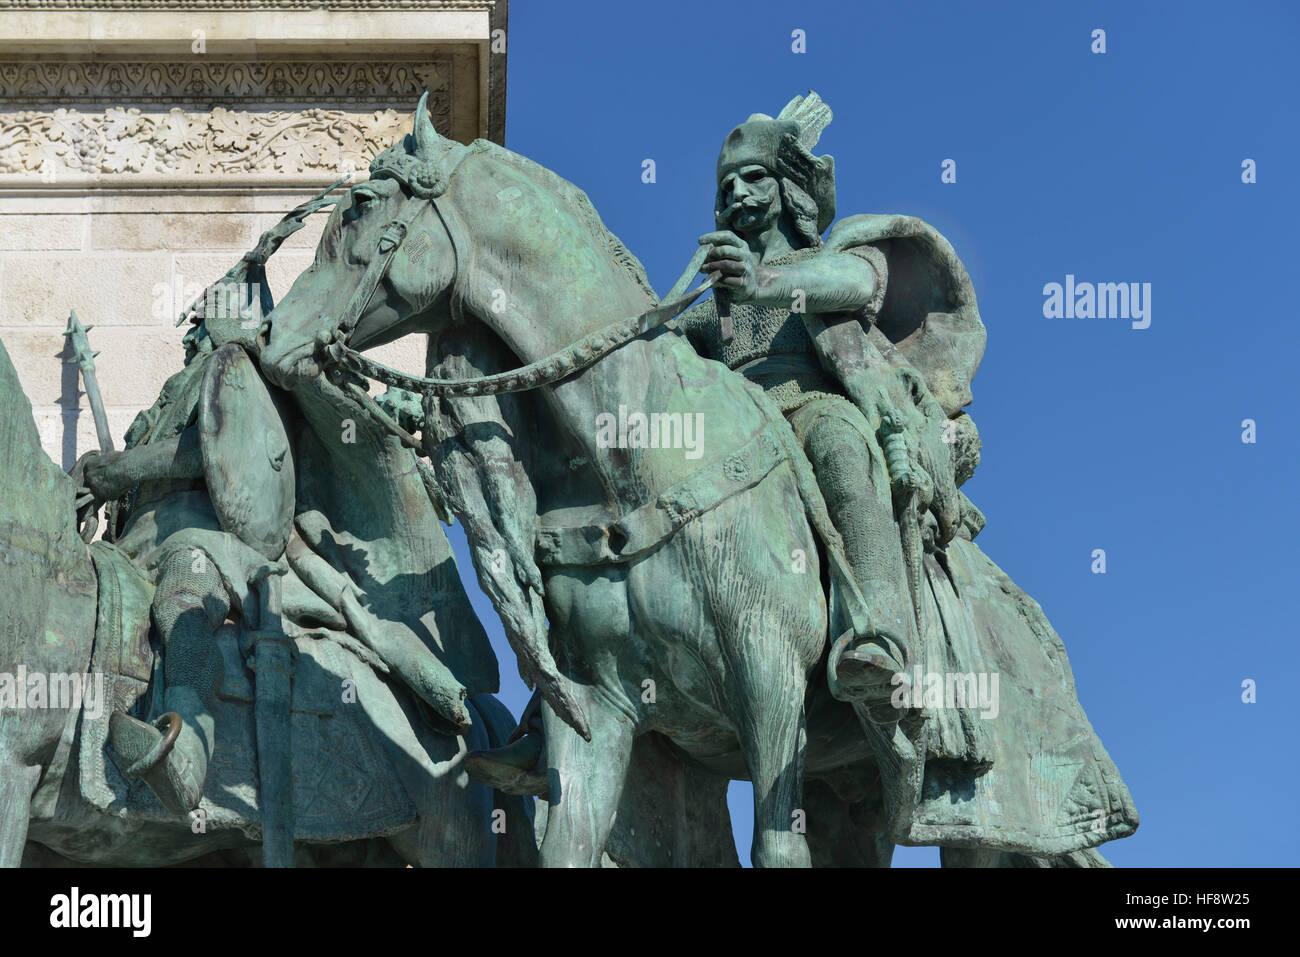 Milleniumsdenkmal, Heldenplatz, Budapest, Ungarn, heroic place, Hungary - Stock Image